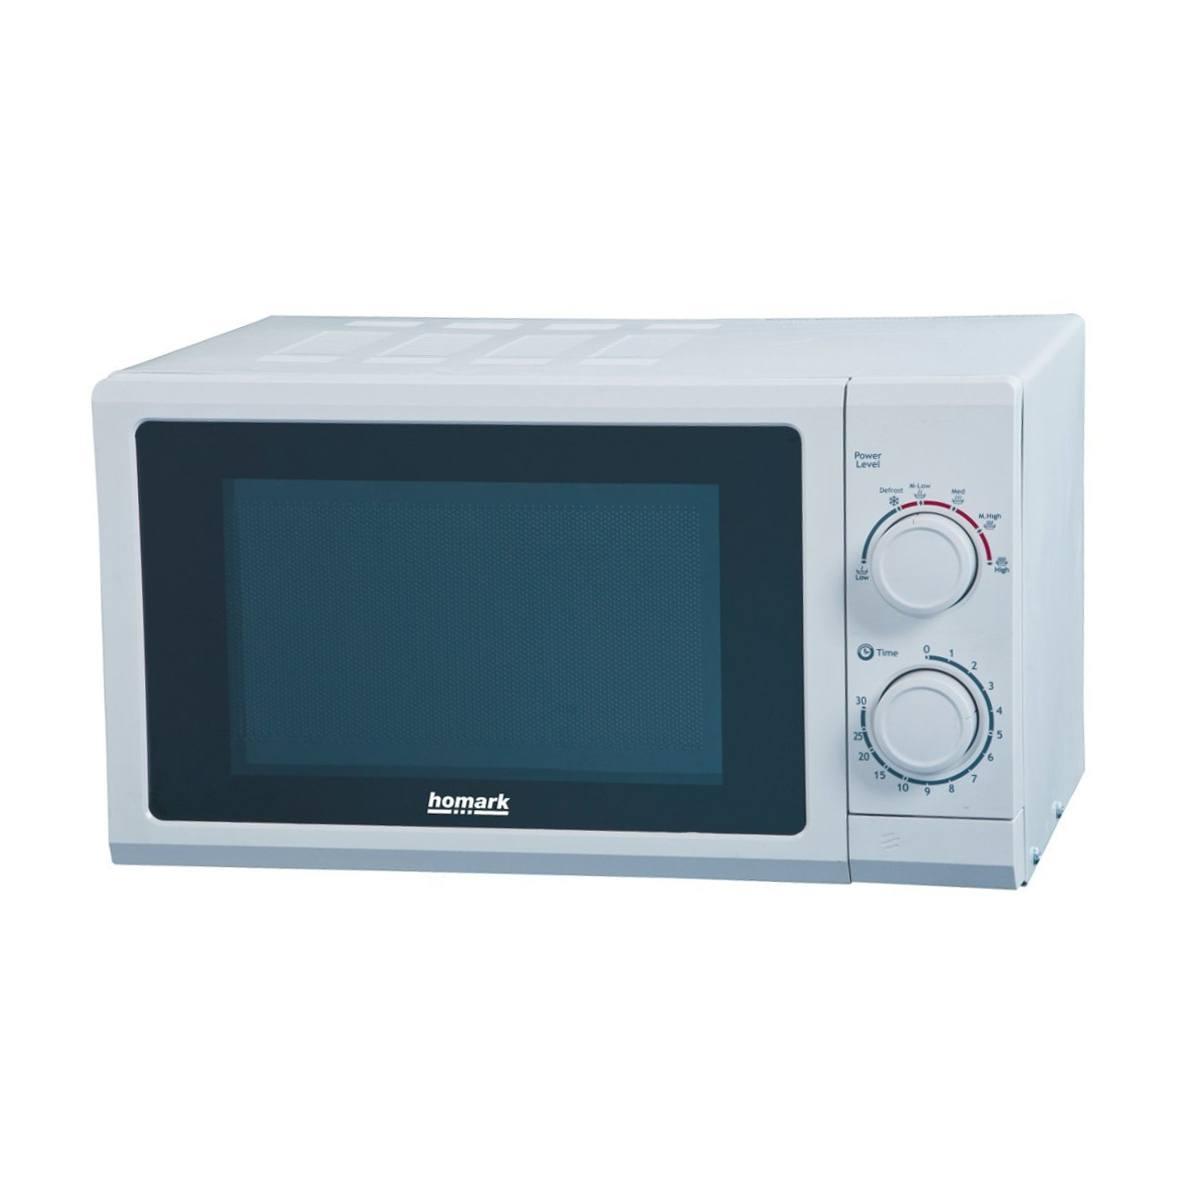 Homark 17lmwh 700w 17l Manual Control Microwave